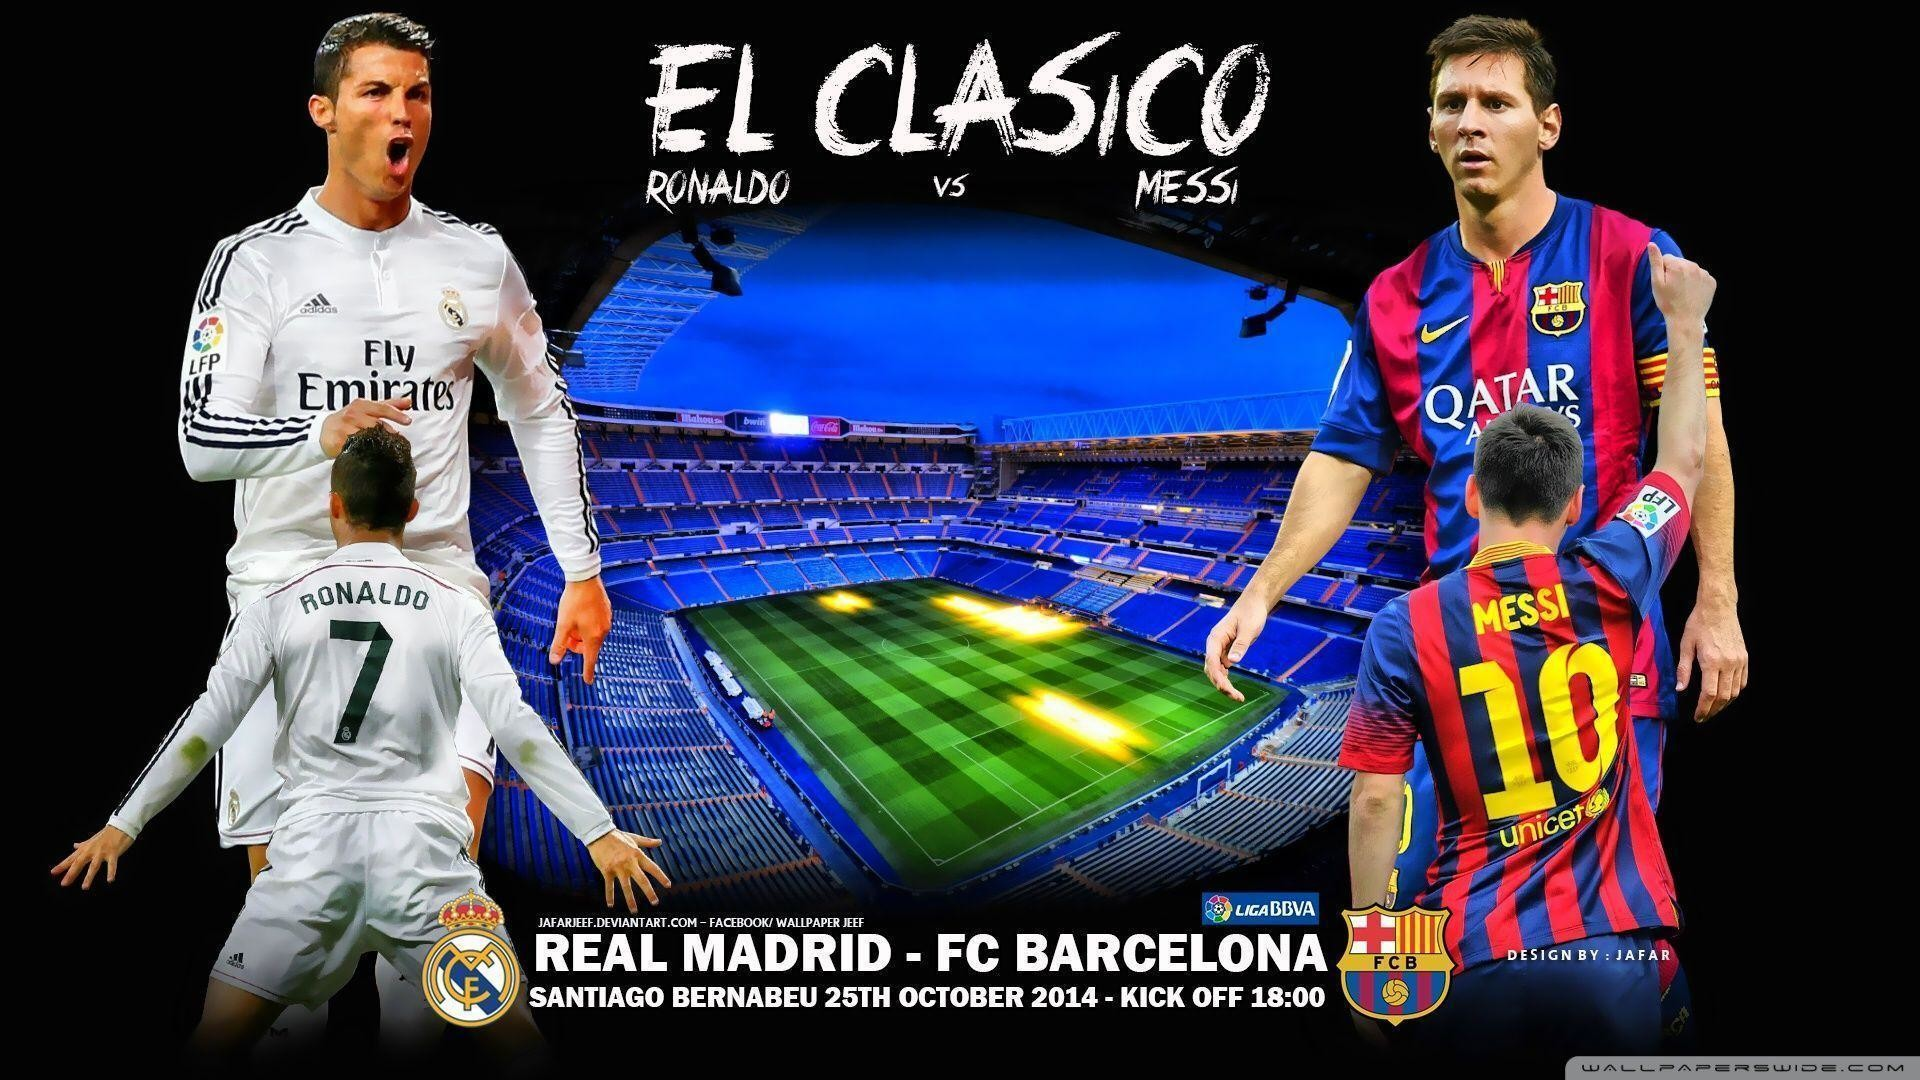 Ronaldo And Messi Wallpaper 75 Images